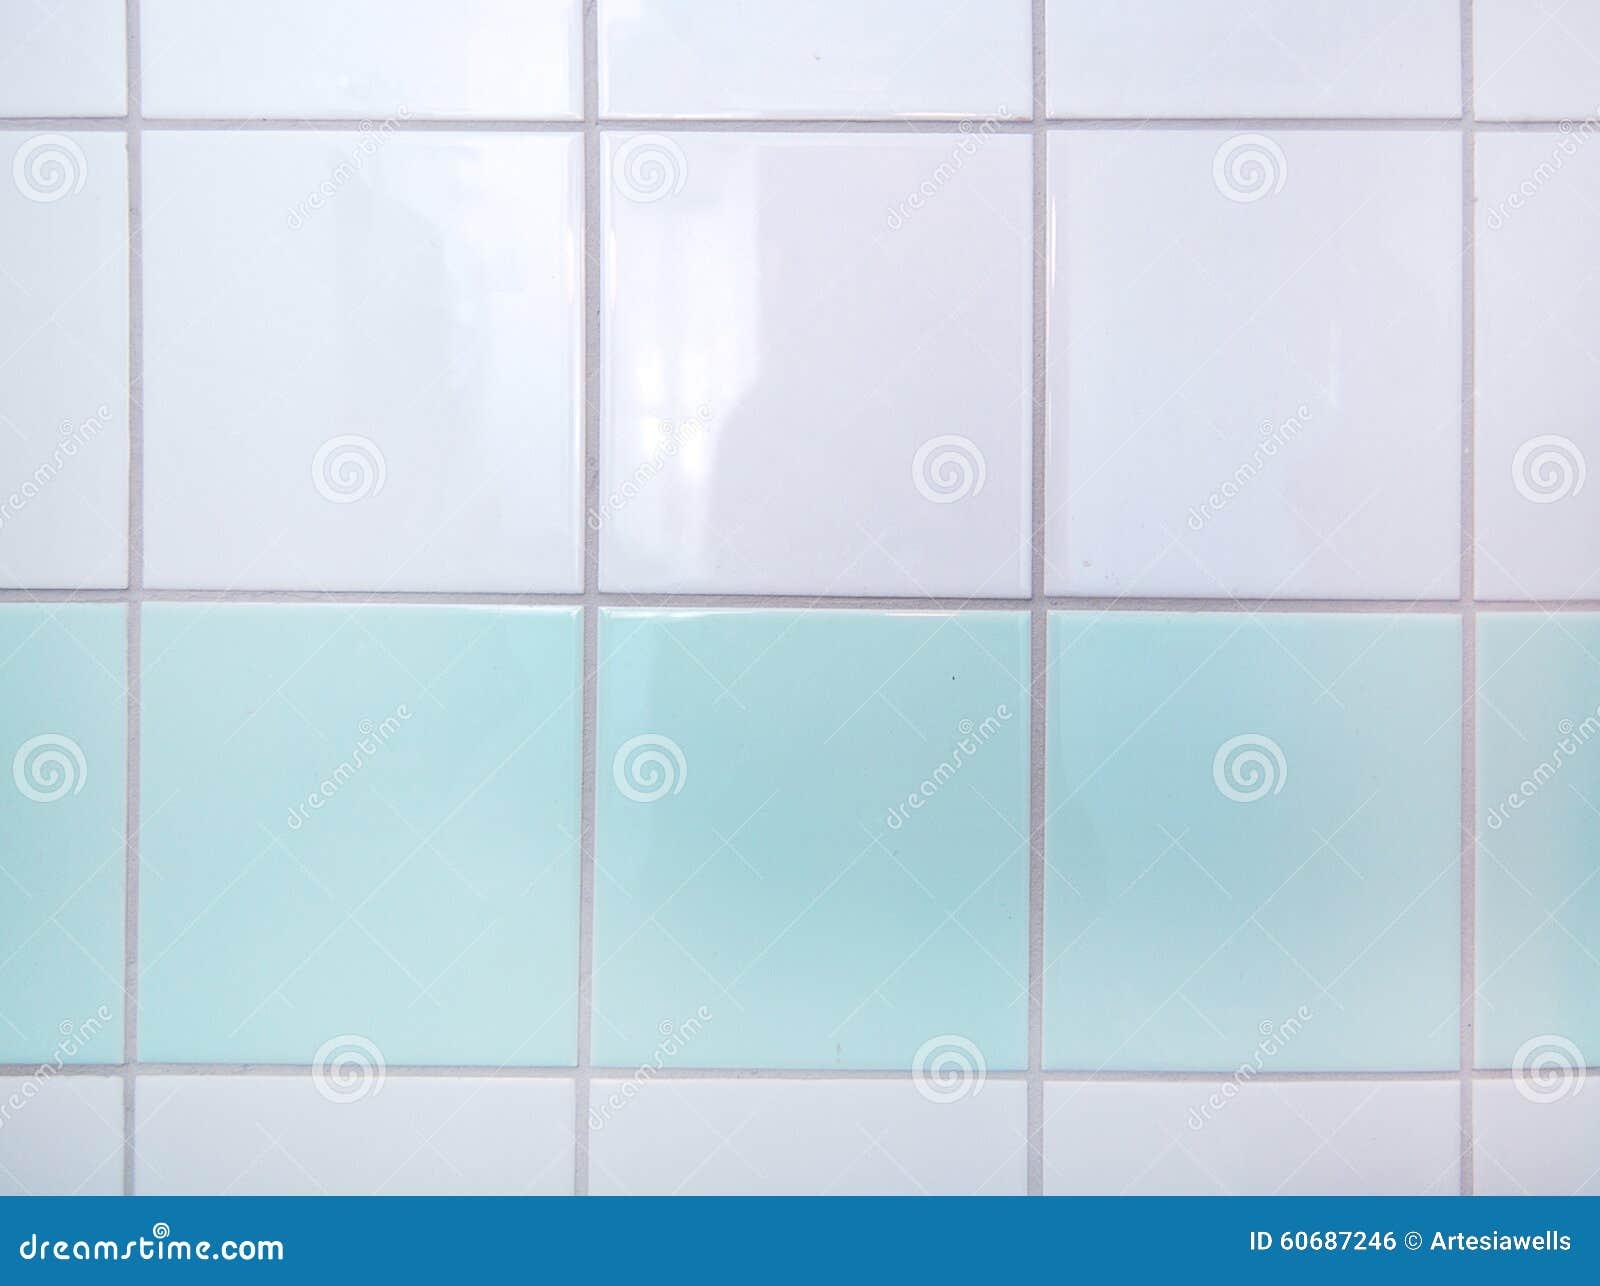 Bathroom tiles background stock photo. Image of water - 60687246